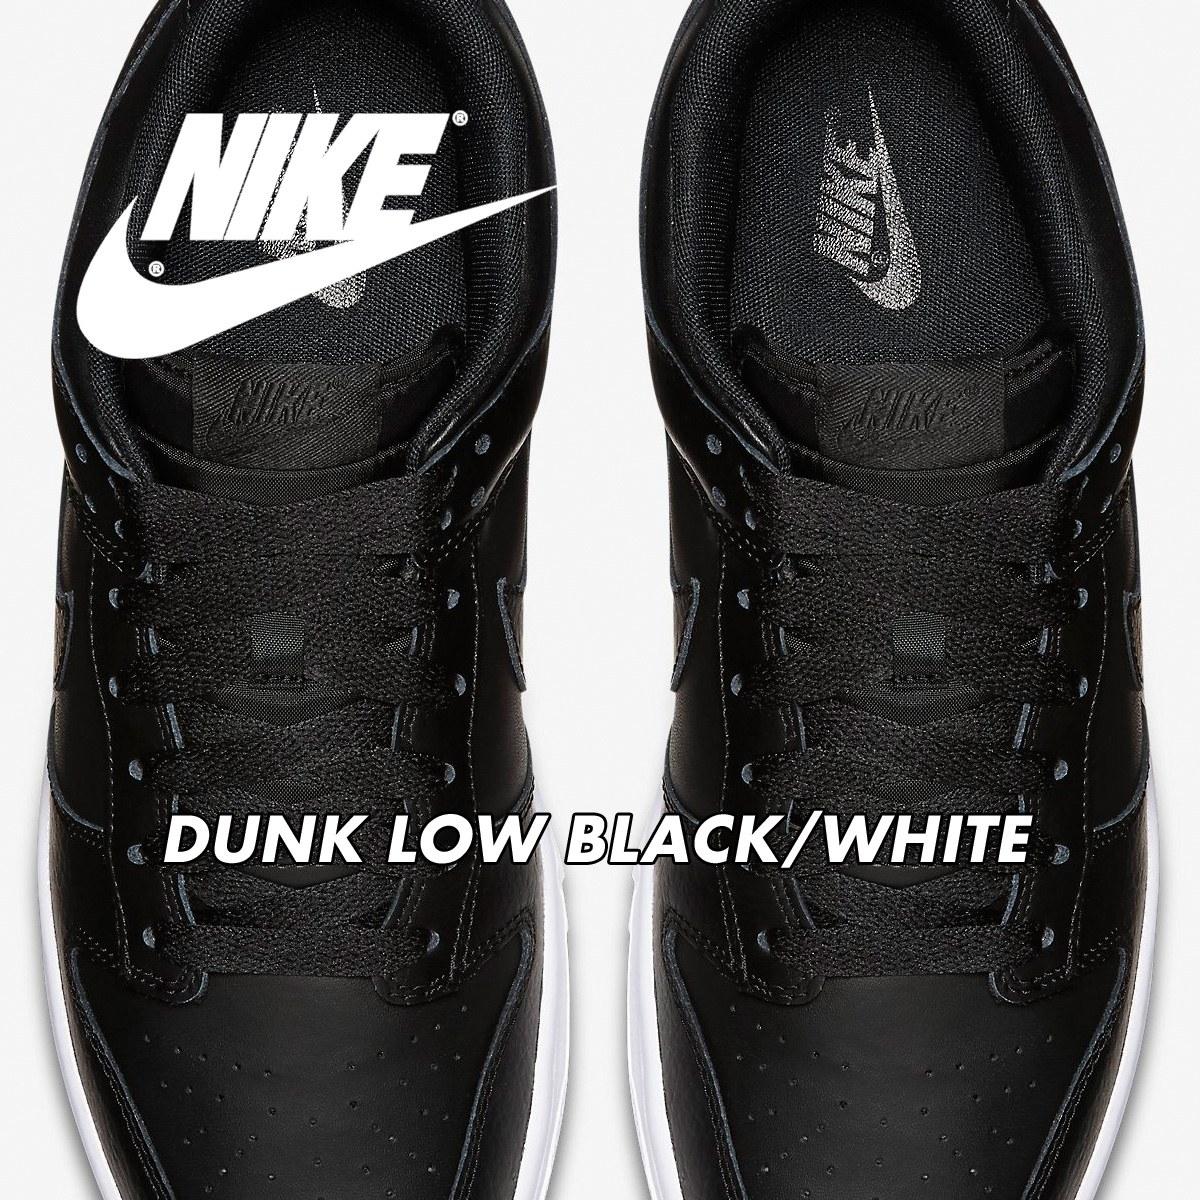 e5e75c2b553c ALLSPORTS  NIKE Nike dunk low sneakers DUNK LOW men 904